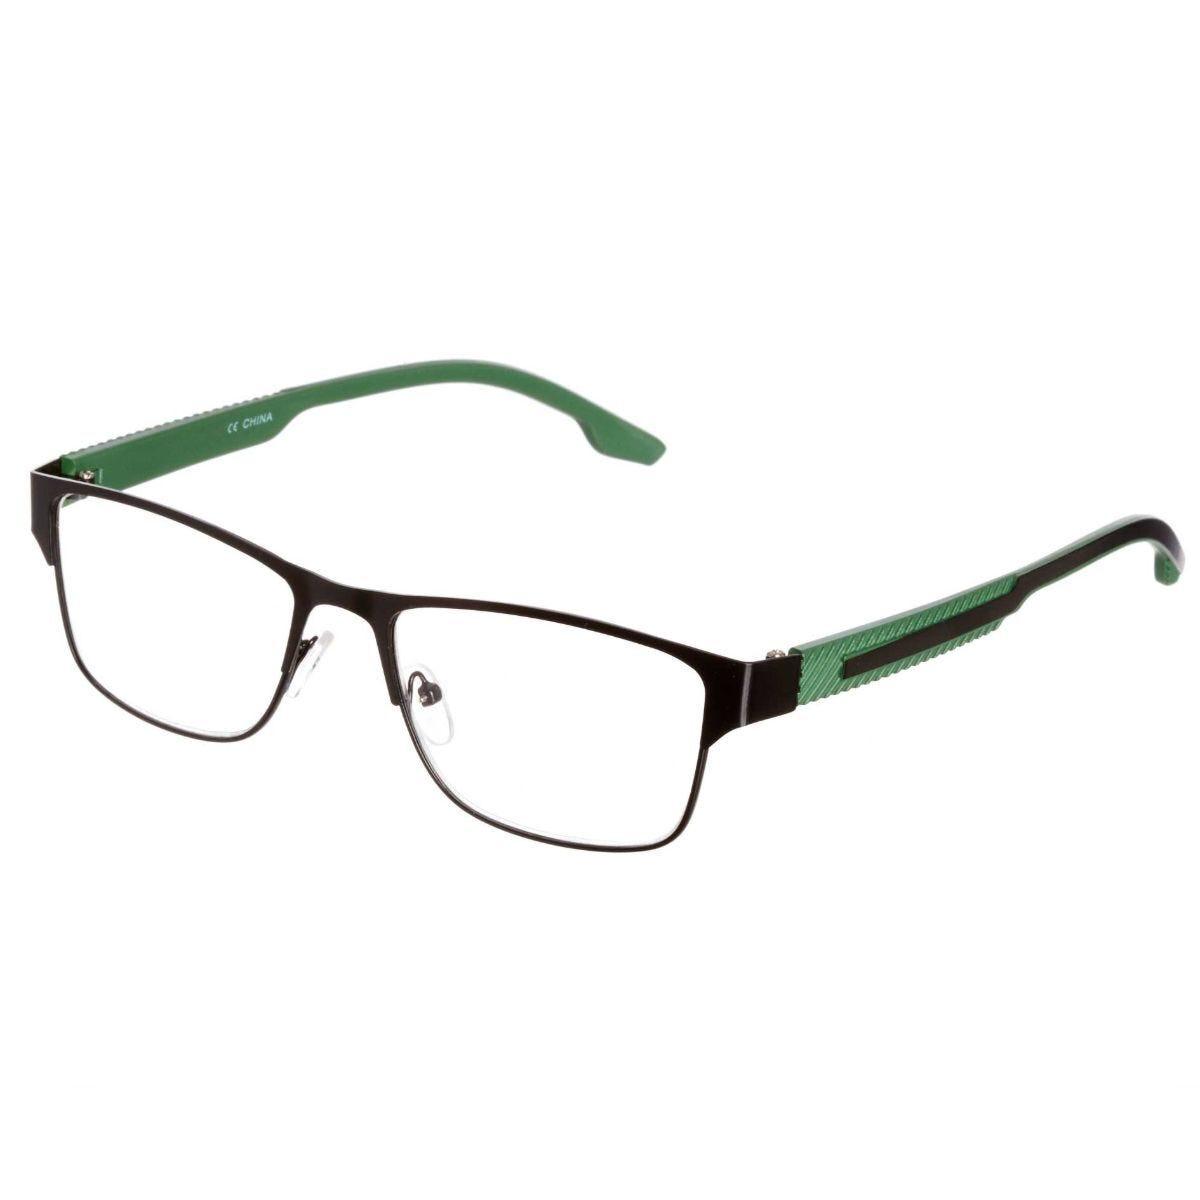 Ryman Reading Glasses + 2.0 Black and Green Frame